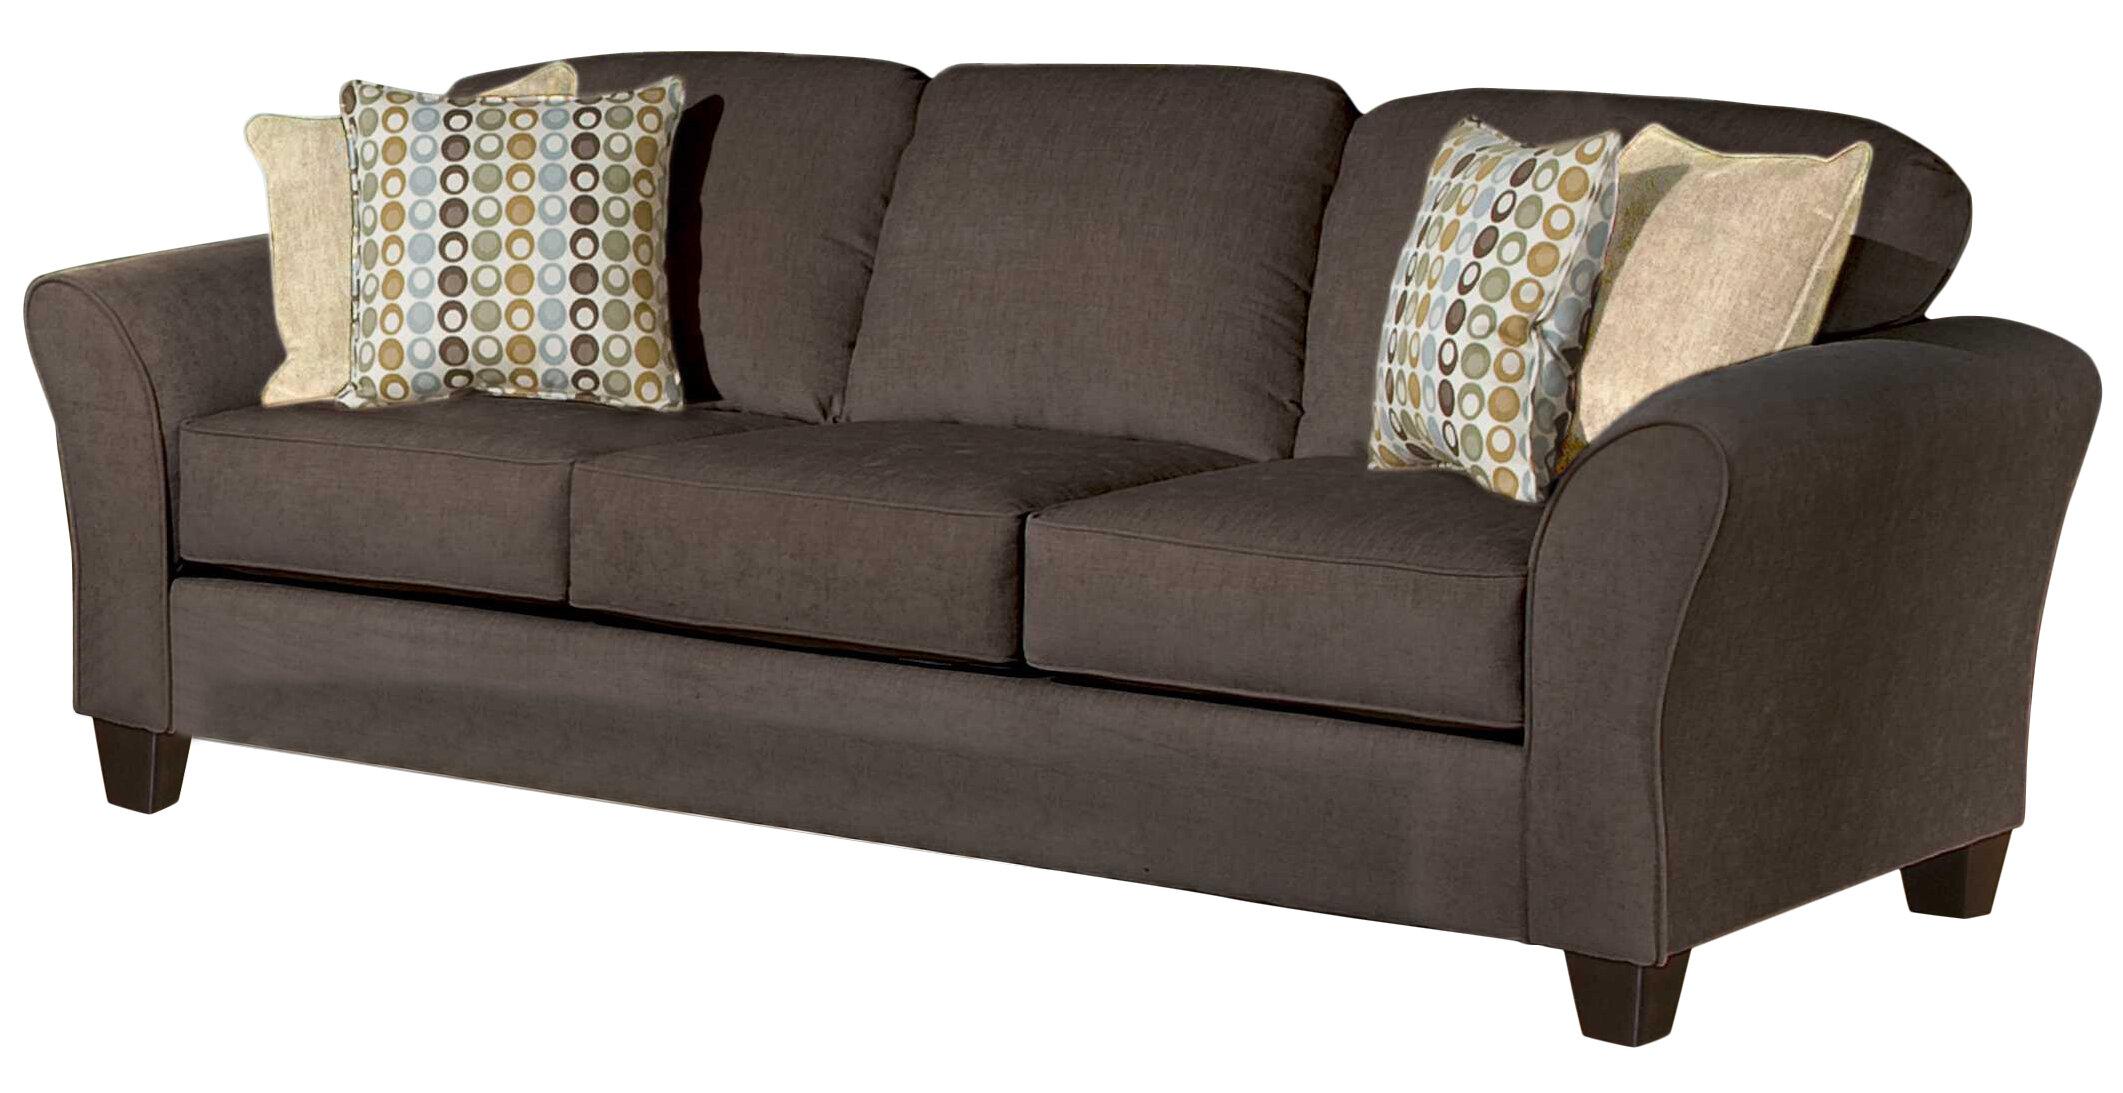 Three Posts Serta Upholstery Franklin Sofa U0026 Reviews | Wayfair